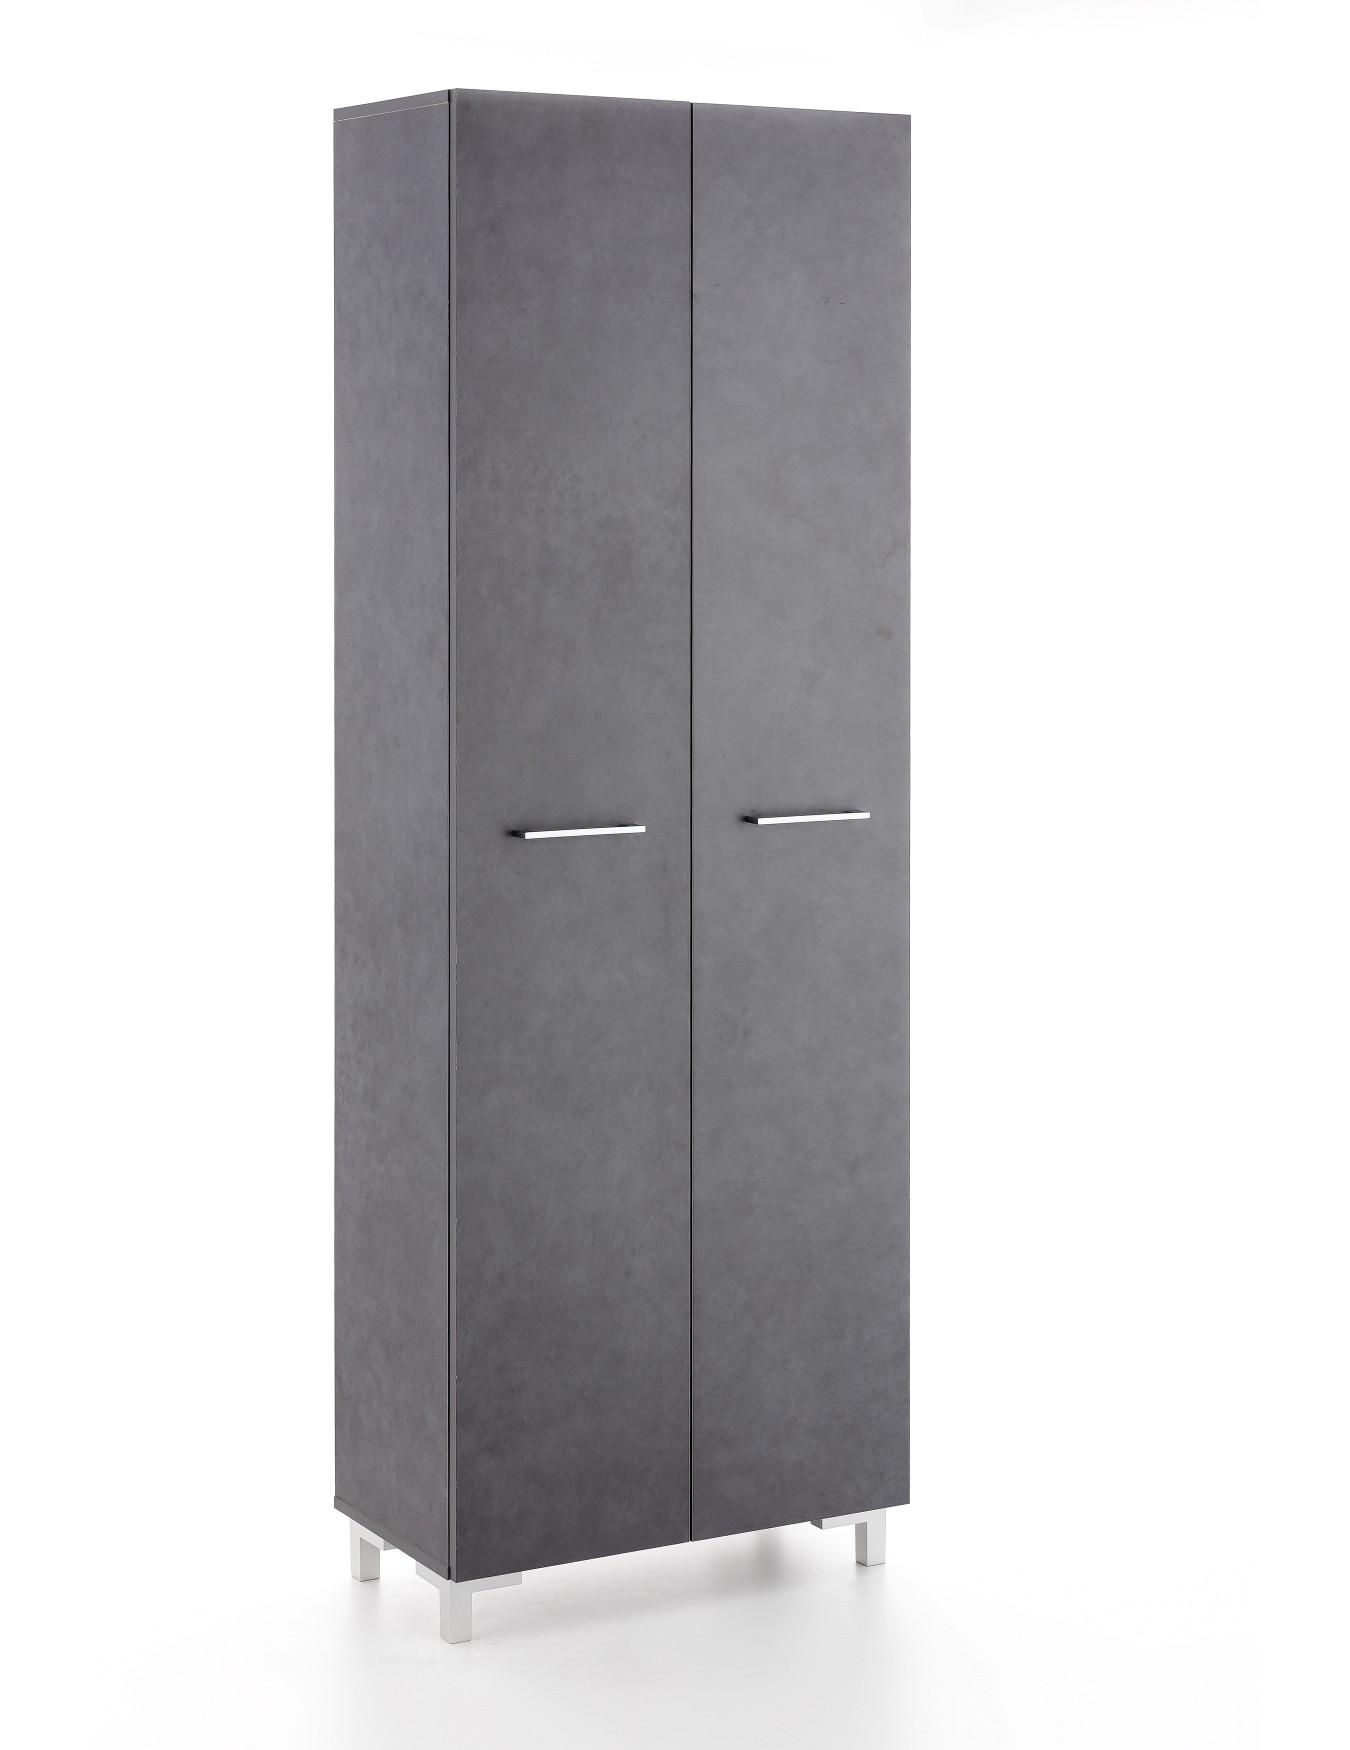 beautiful badezimmer hochschrank 60 cm breit ideas. Black Bedroom Furniture Sets. Home Design Ideas